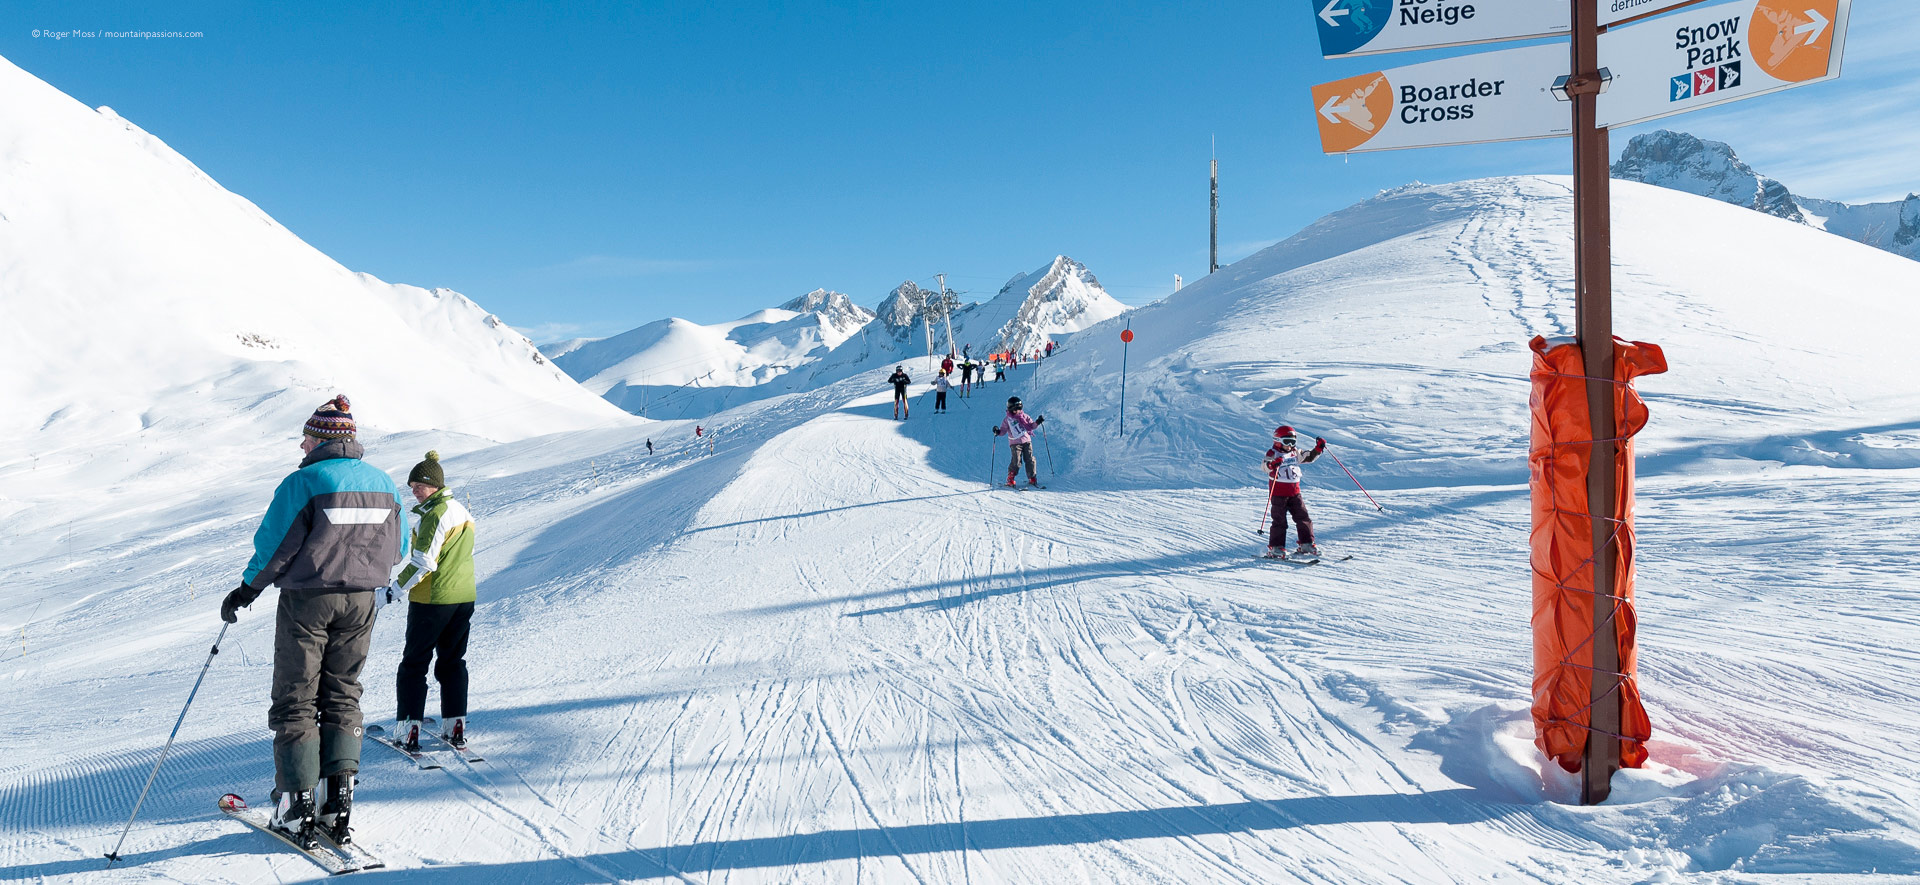 Older skiers being passed by ski school children's group